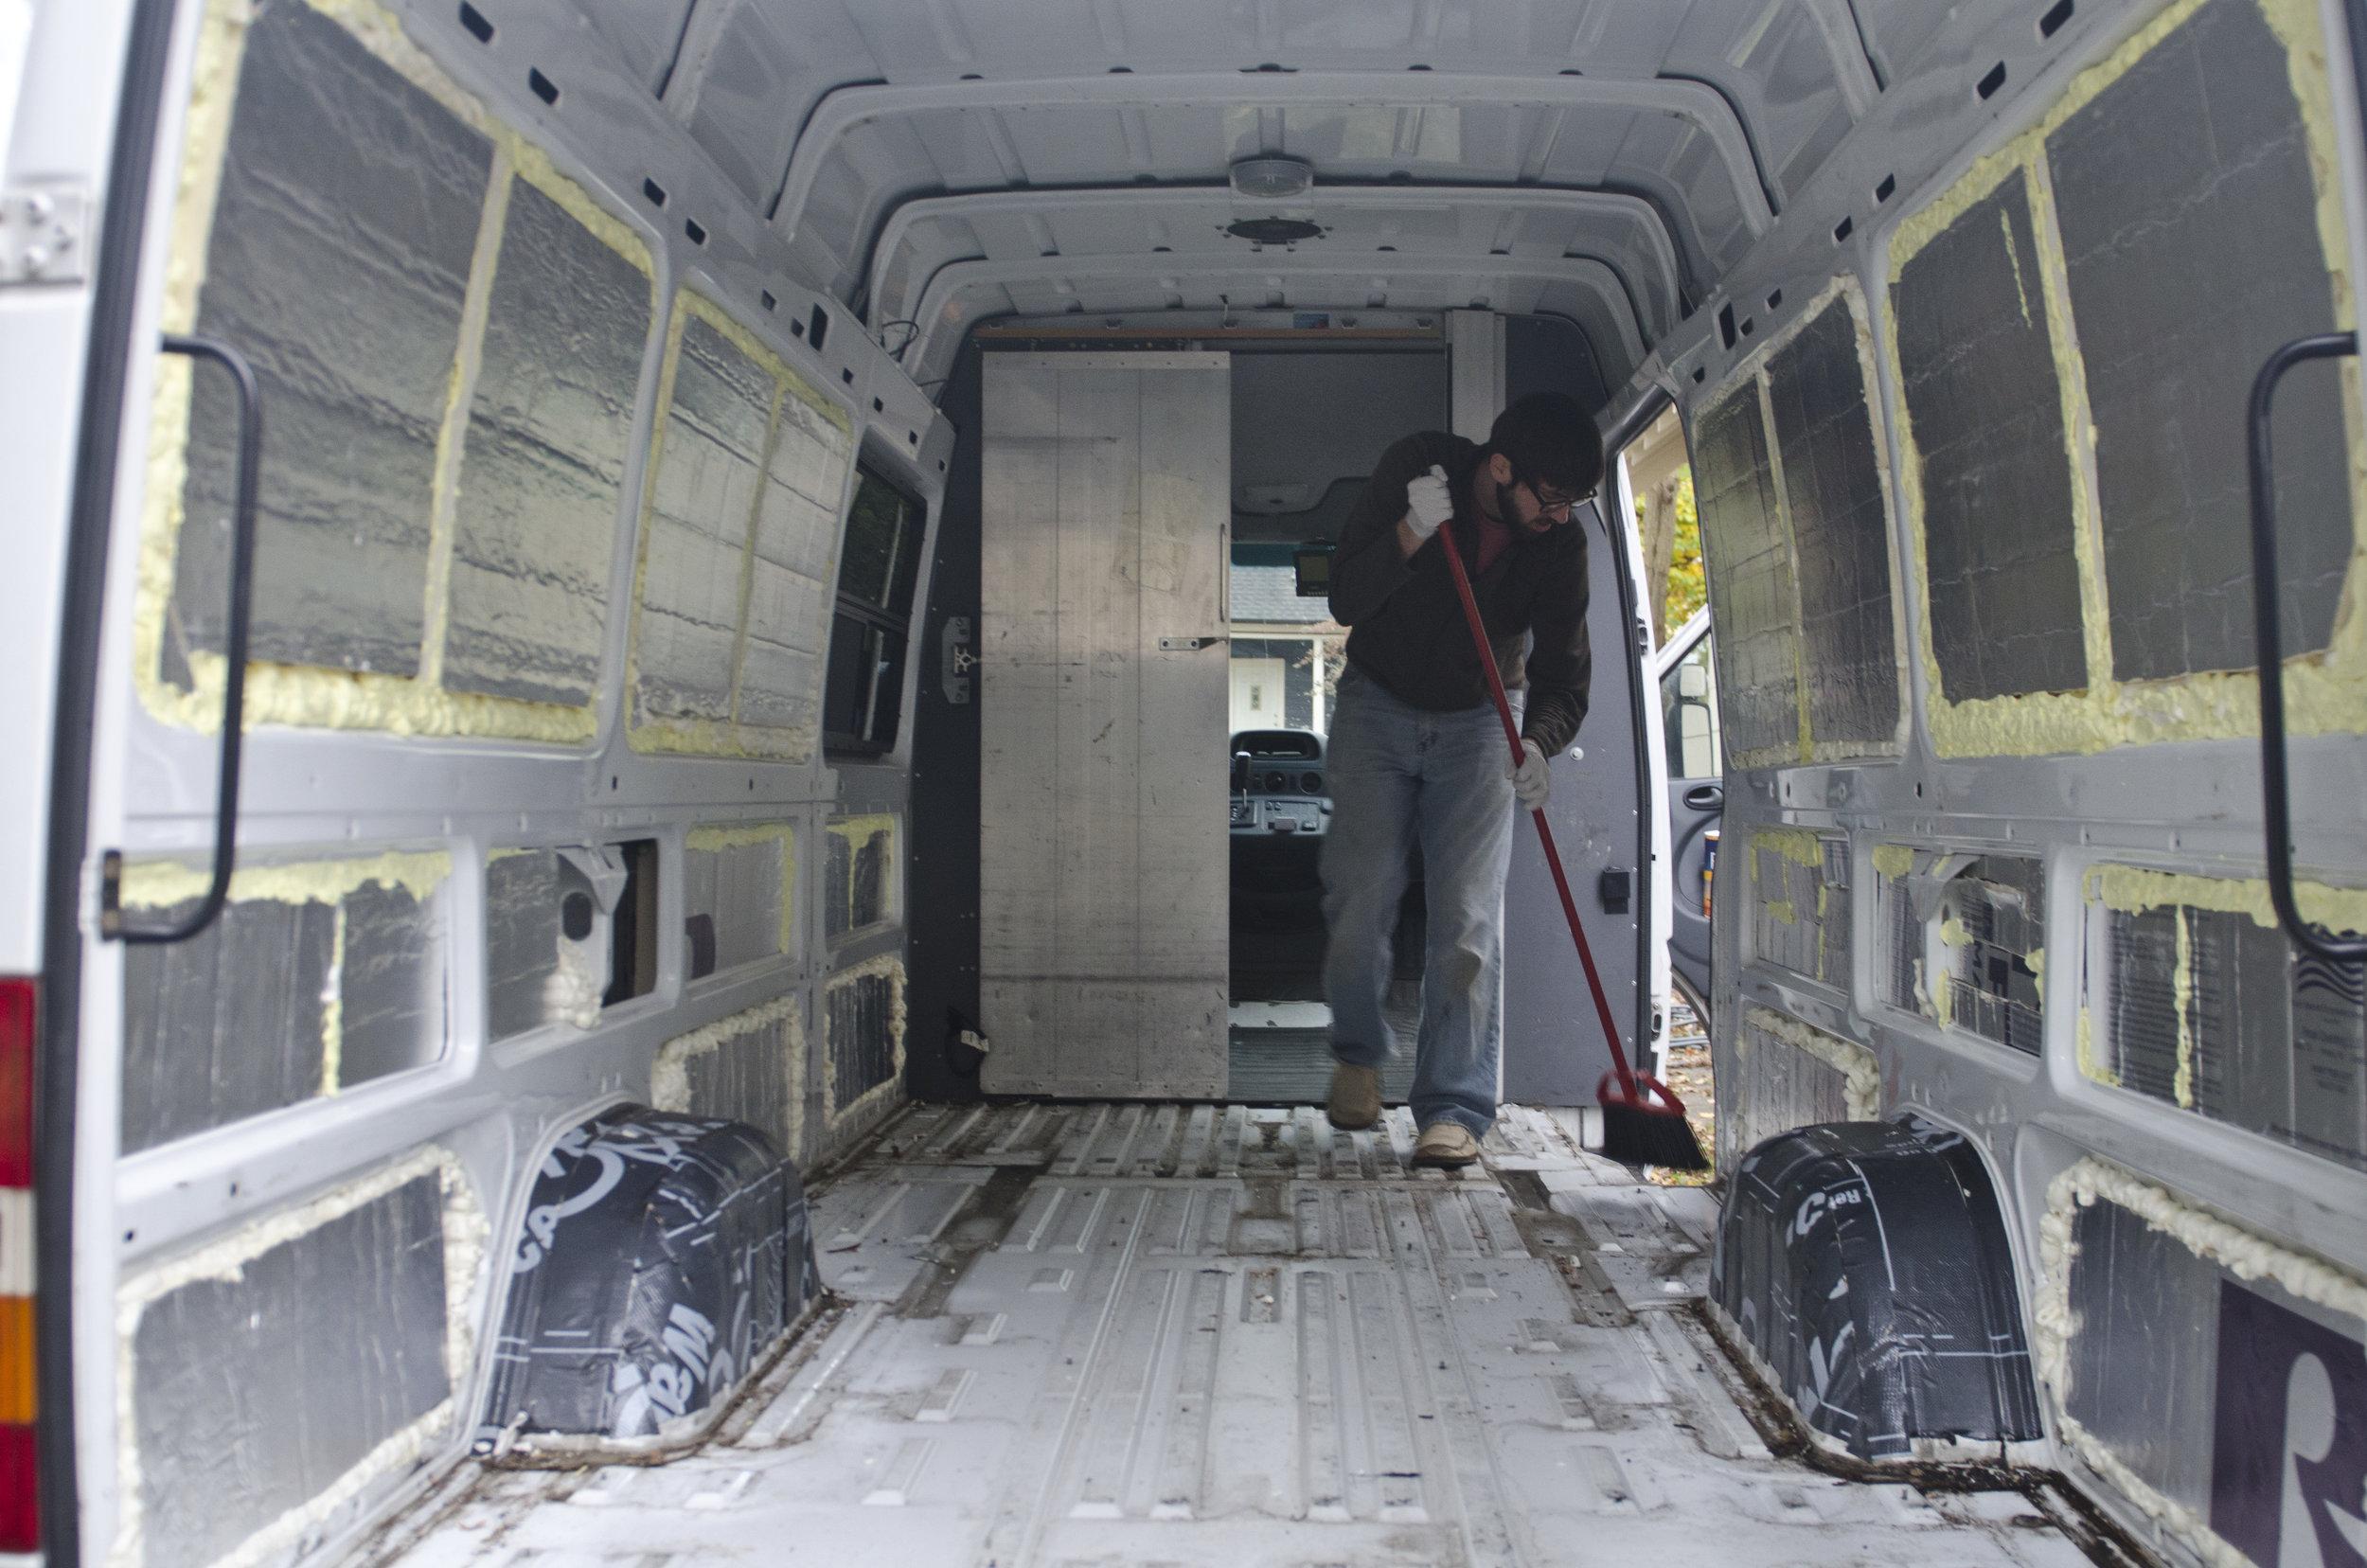 From FedEx Van to Home — The Wandering Woods